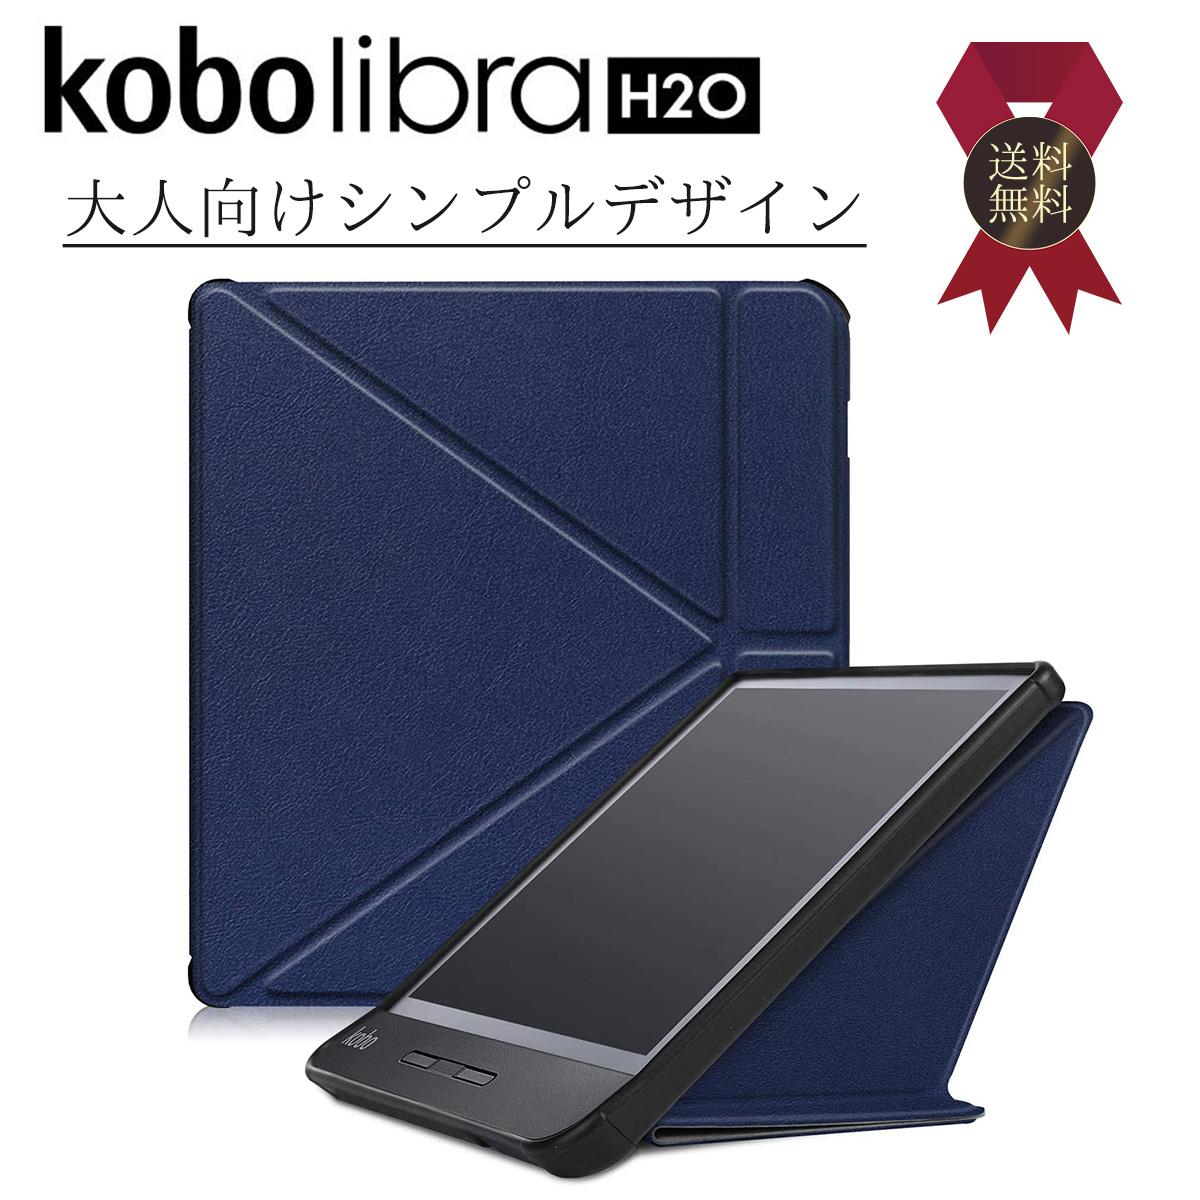 Kobo カバー ケース 9 10限定 全10%引券配布 Libra H2O 電子書籍 リーダー オートスリープ スマート タブレットケース 紺 ネイビー オート 薄型 セール価格 フラップ Book スピード対応 全国送料無料 タブレットカバー RAKUTEN 軽量 リブラ スリープ コボ